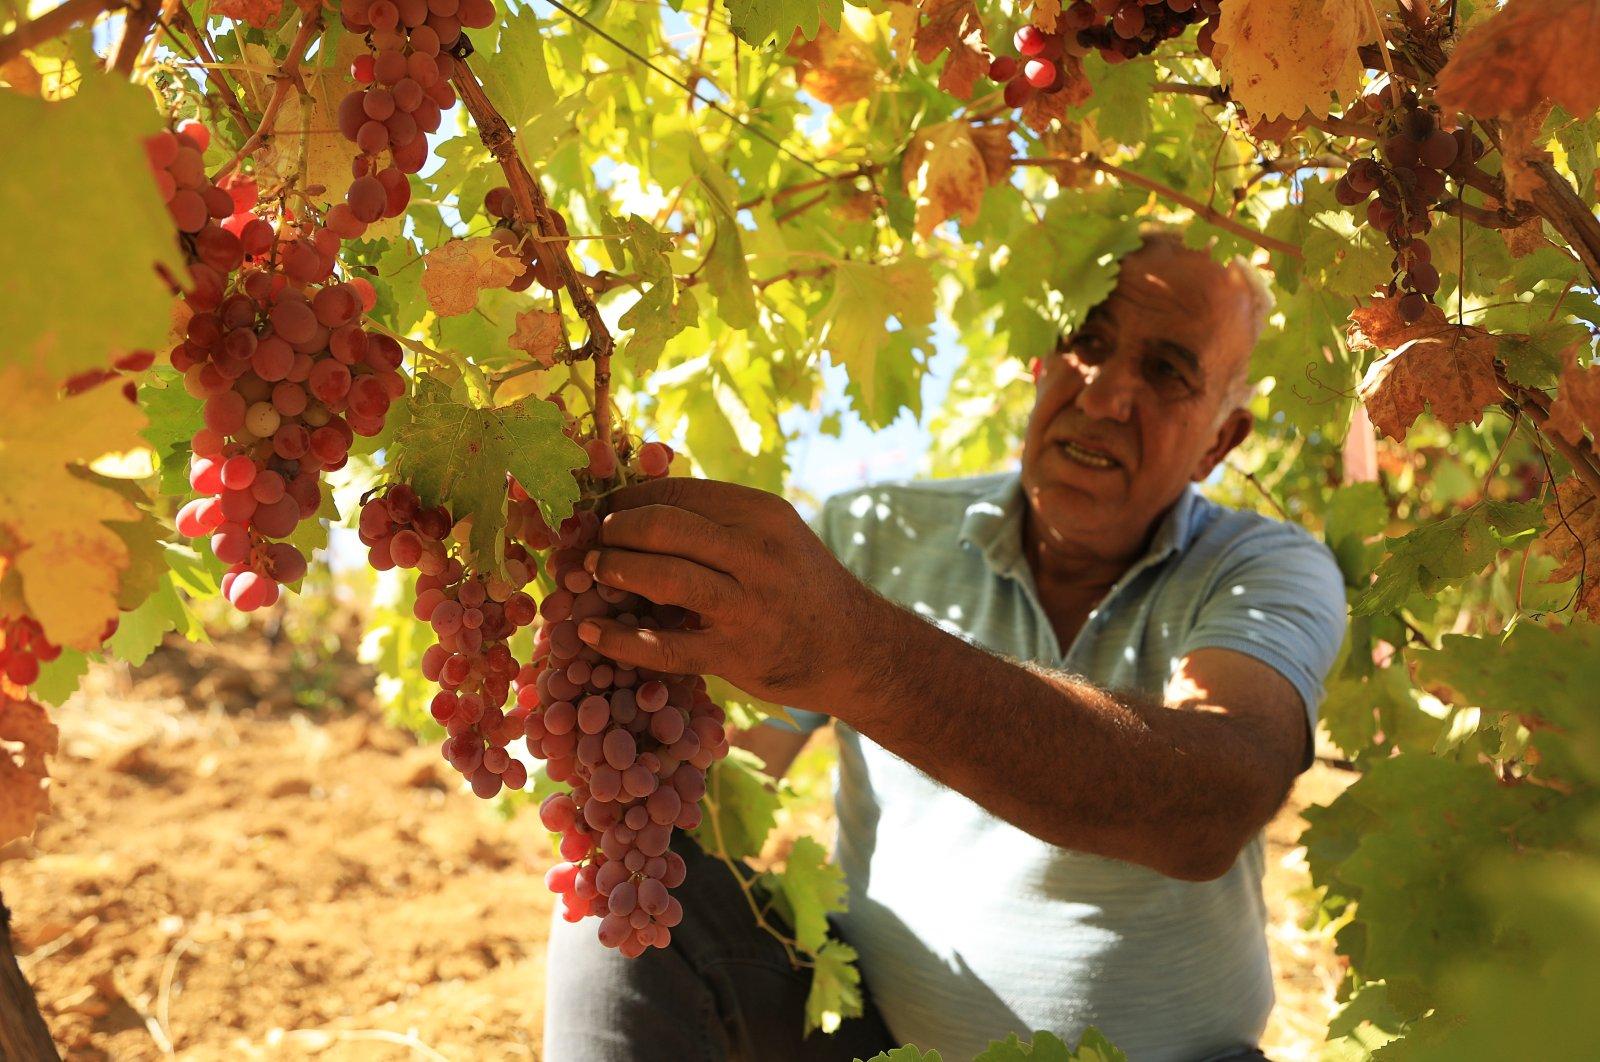 Mehmet Baysal shows the grapes he grew in Bingöl, eastern Turkey, Sept. 13, 2021. (AA Photo)